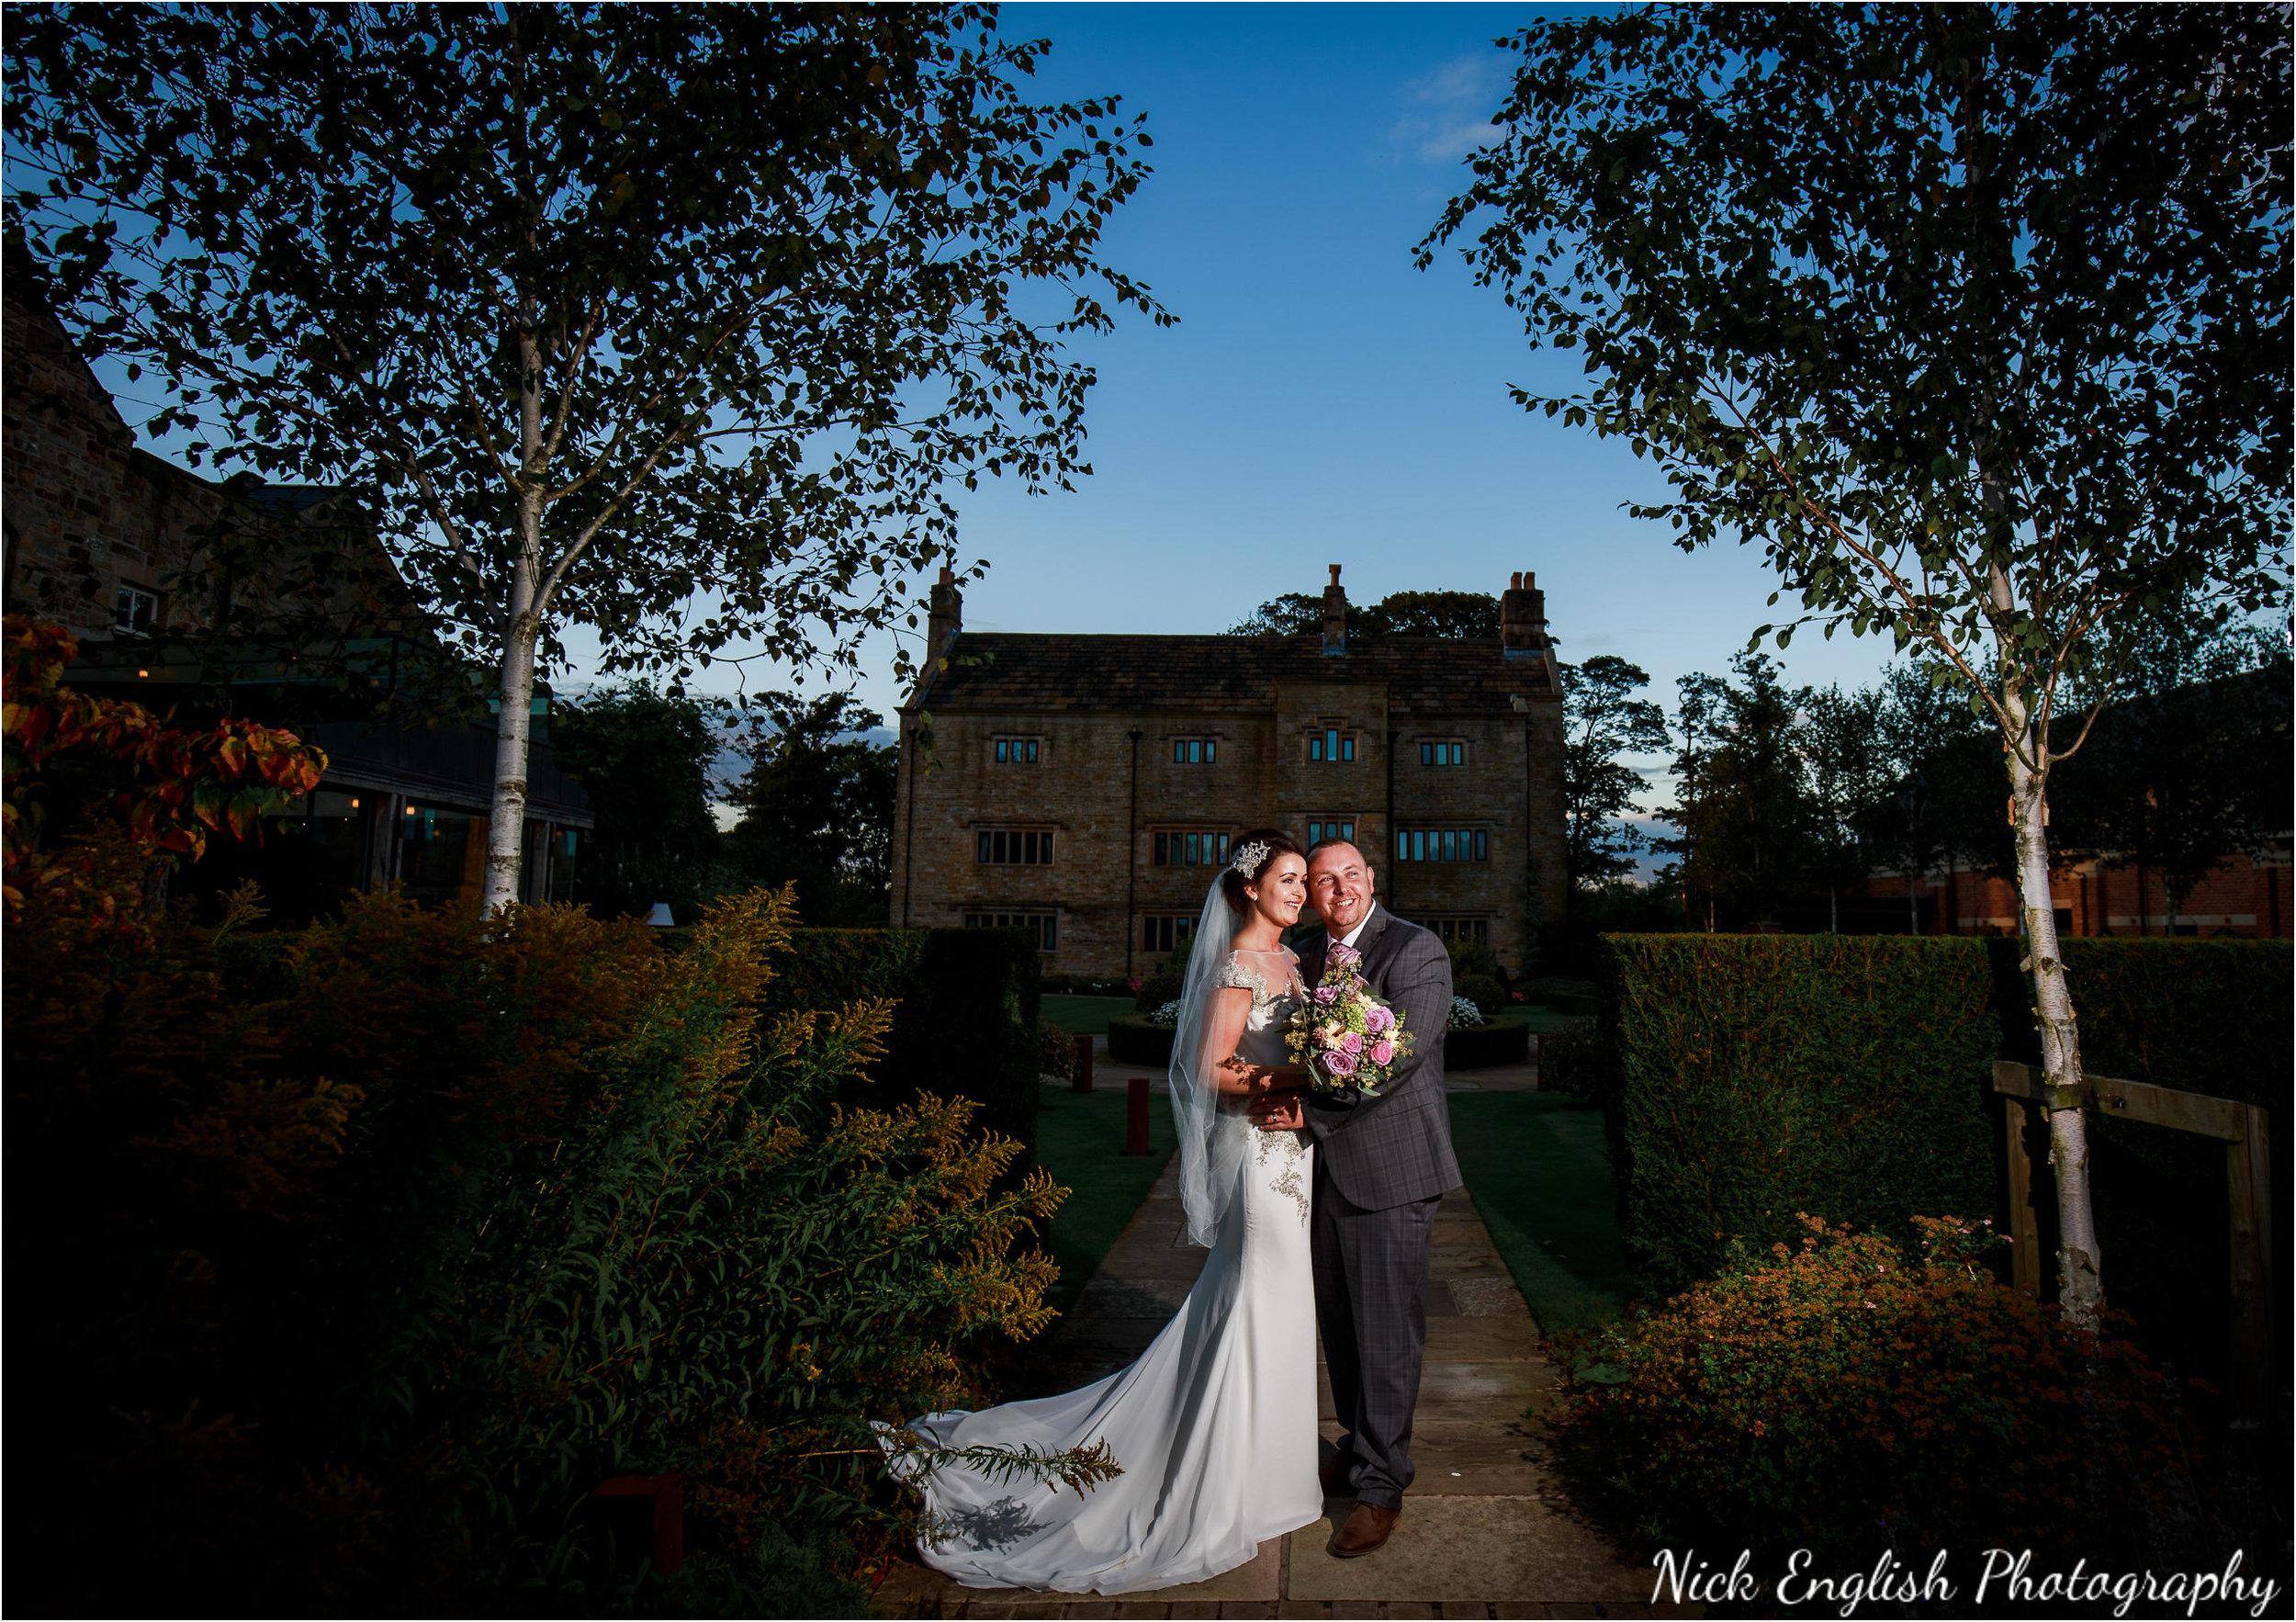 Stacey-Ash-Wedding-Photographs-Stanley-House-Preston-Lancashire-223.jpg